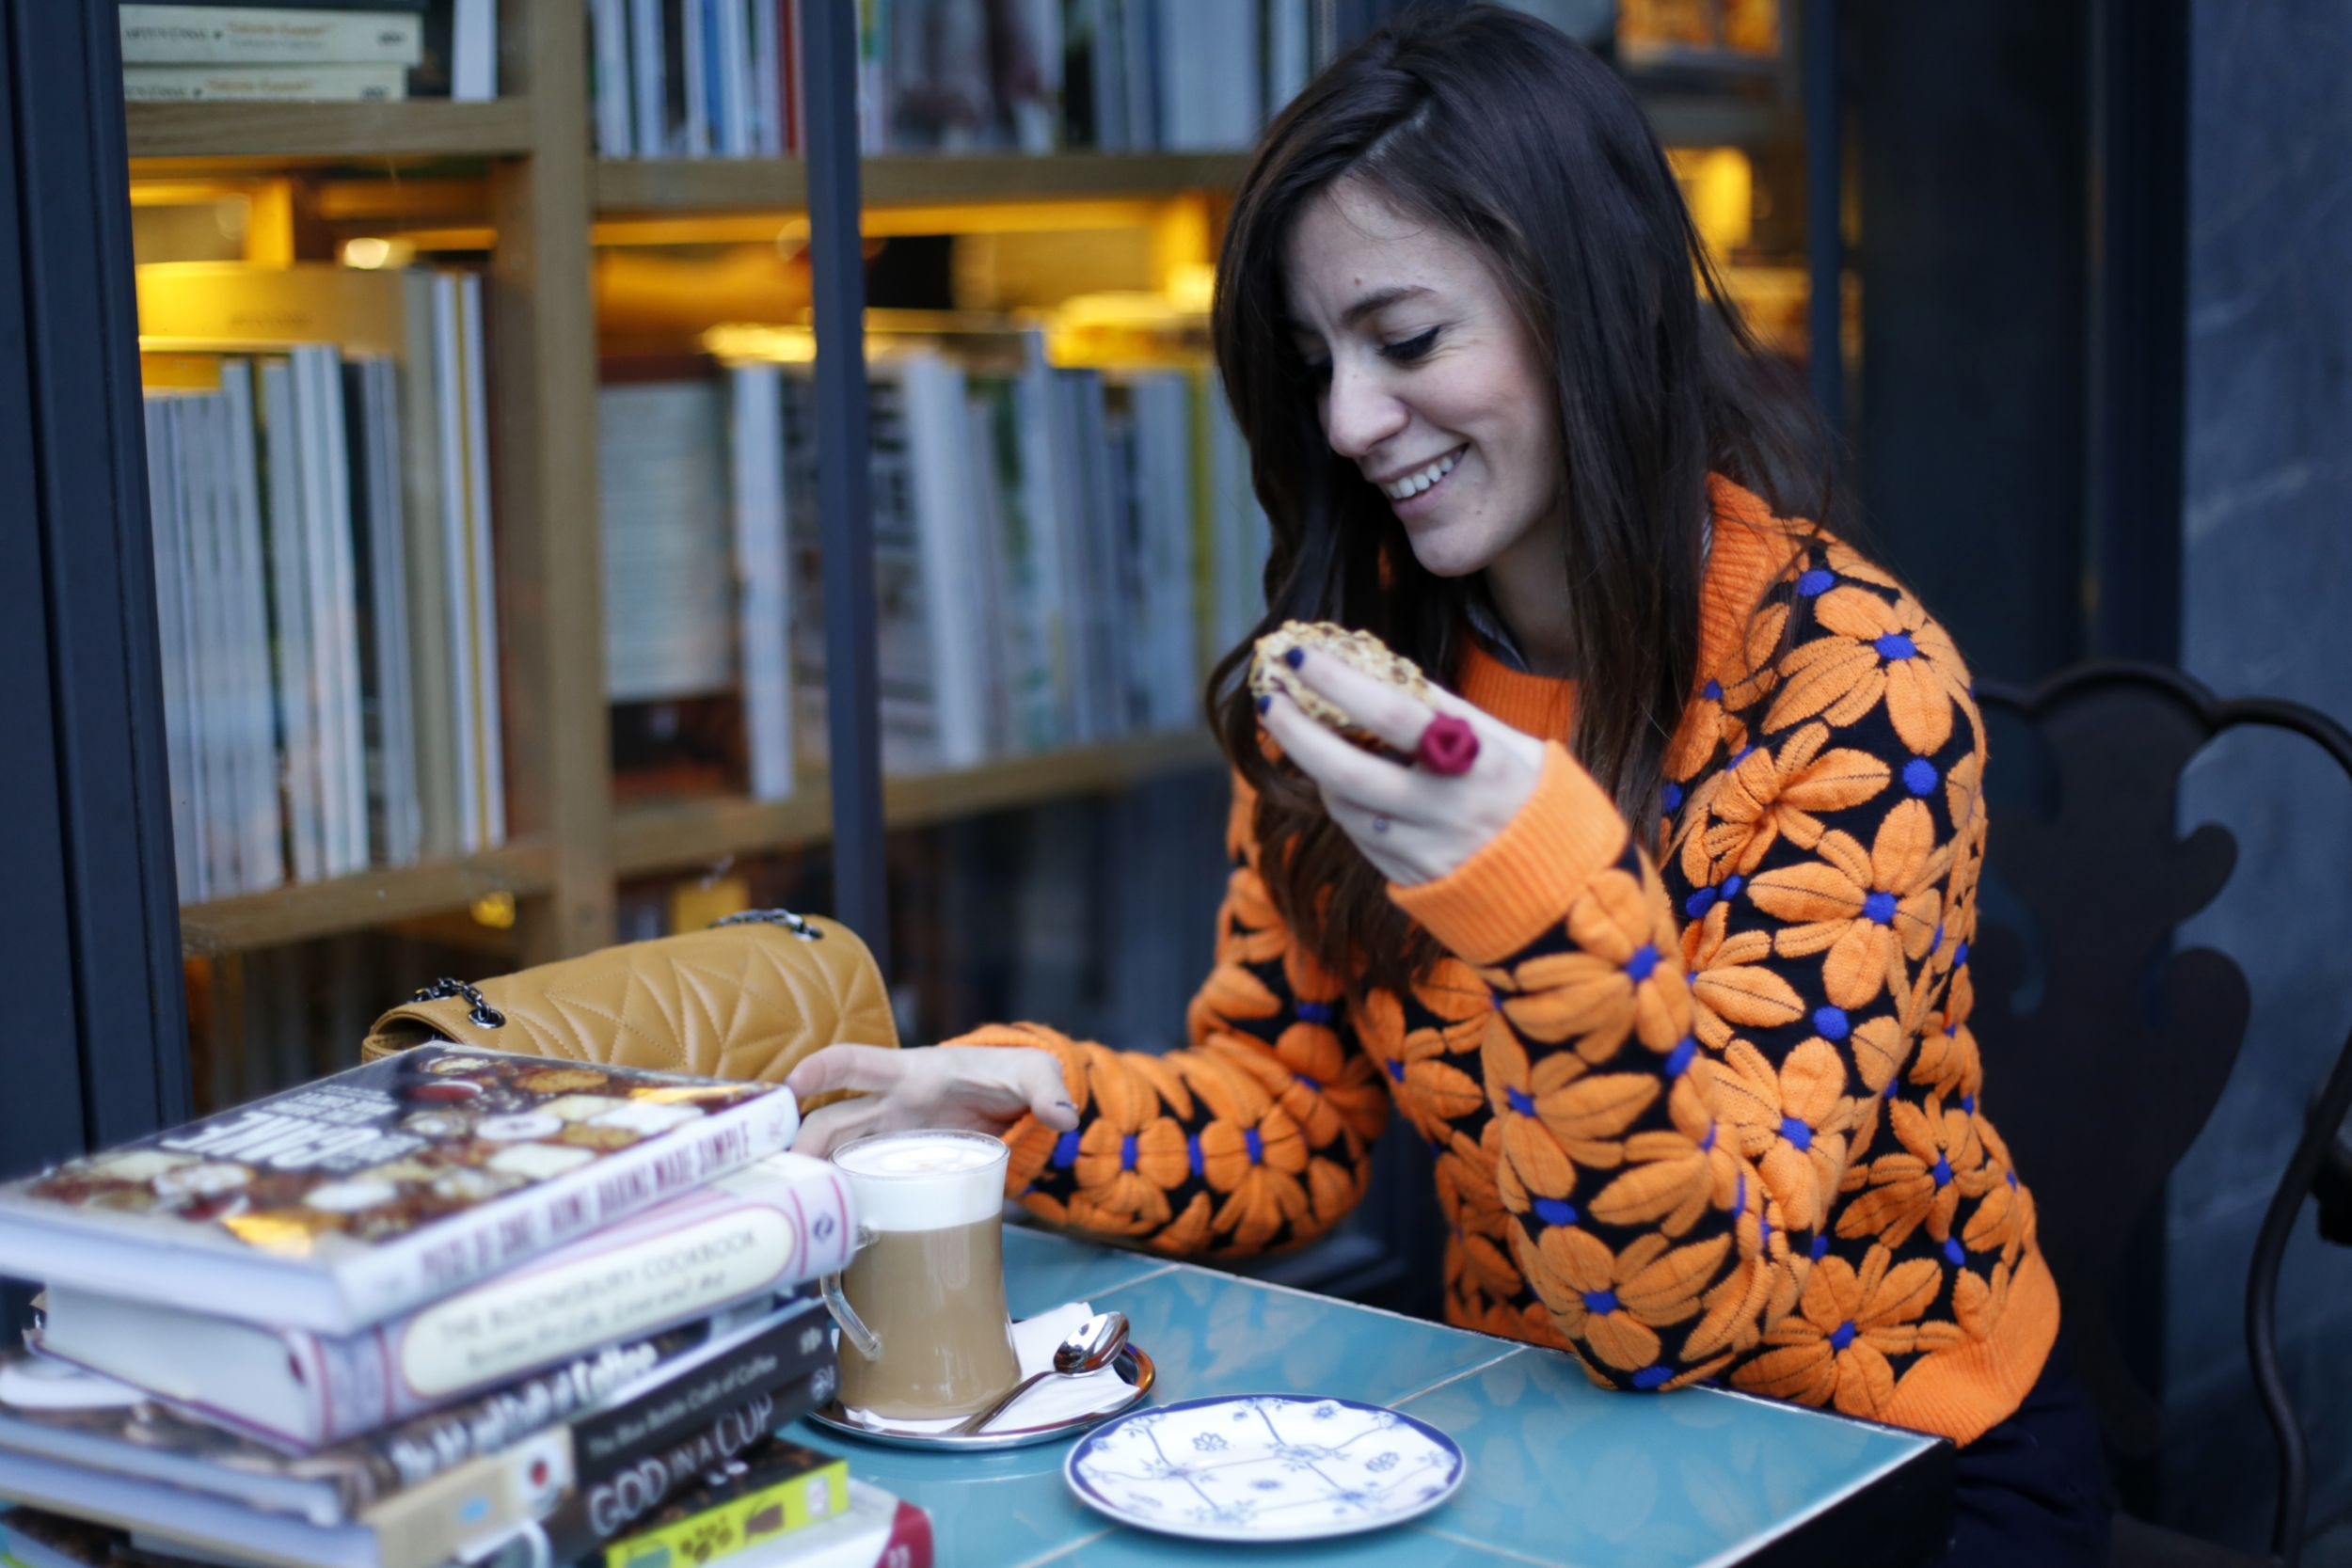 billur saatci, turkish fashion bloggers, offnegiysem, streetstyle, minoa, bookstore, video shooting, zara, nike air max, maid in love, italia independent, gununkahvesi, coffeeoftheday, emma cook